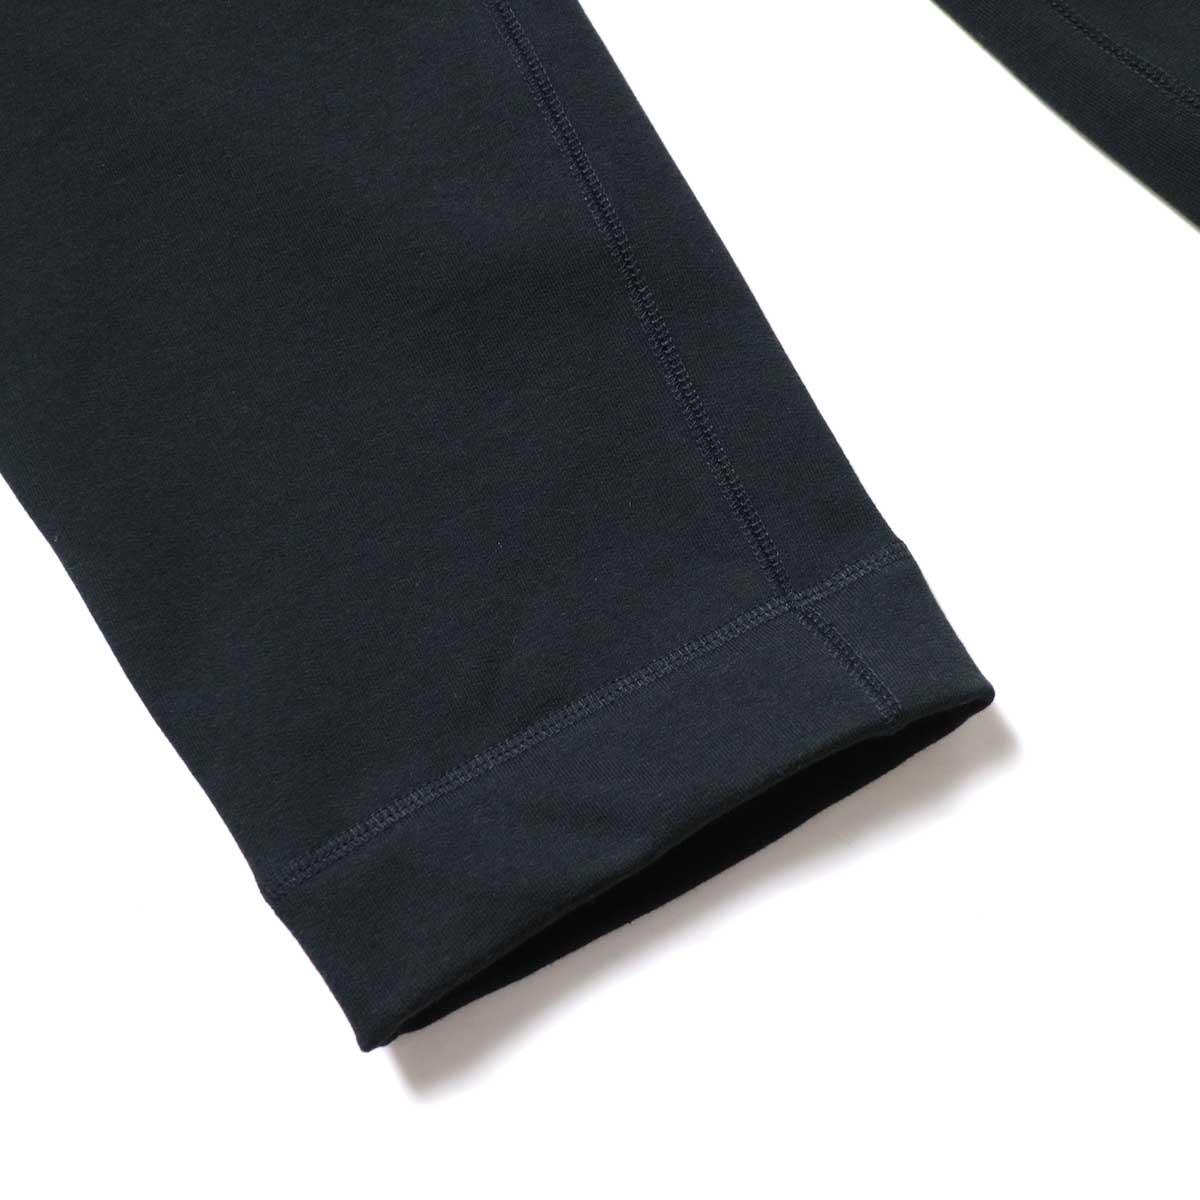 N.HOOLYWOOD / 27RCH-013 Track Pants (Black)裾